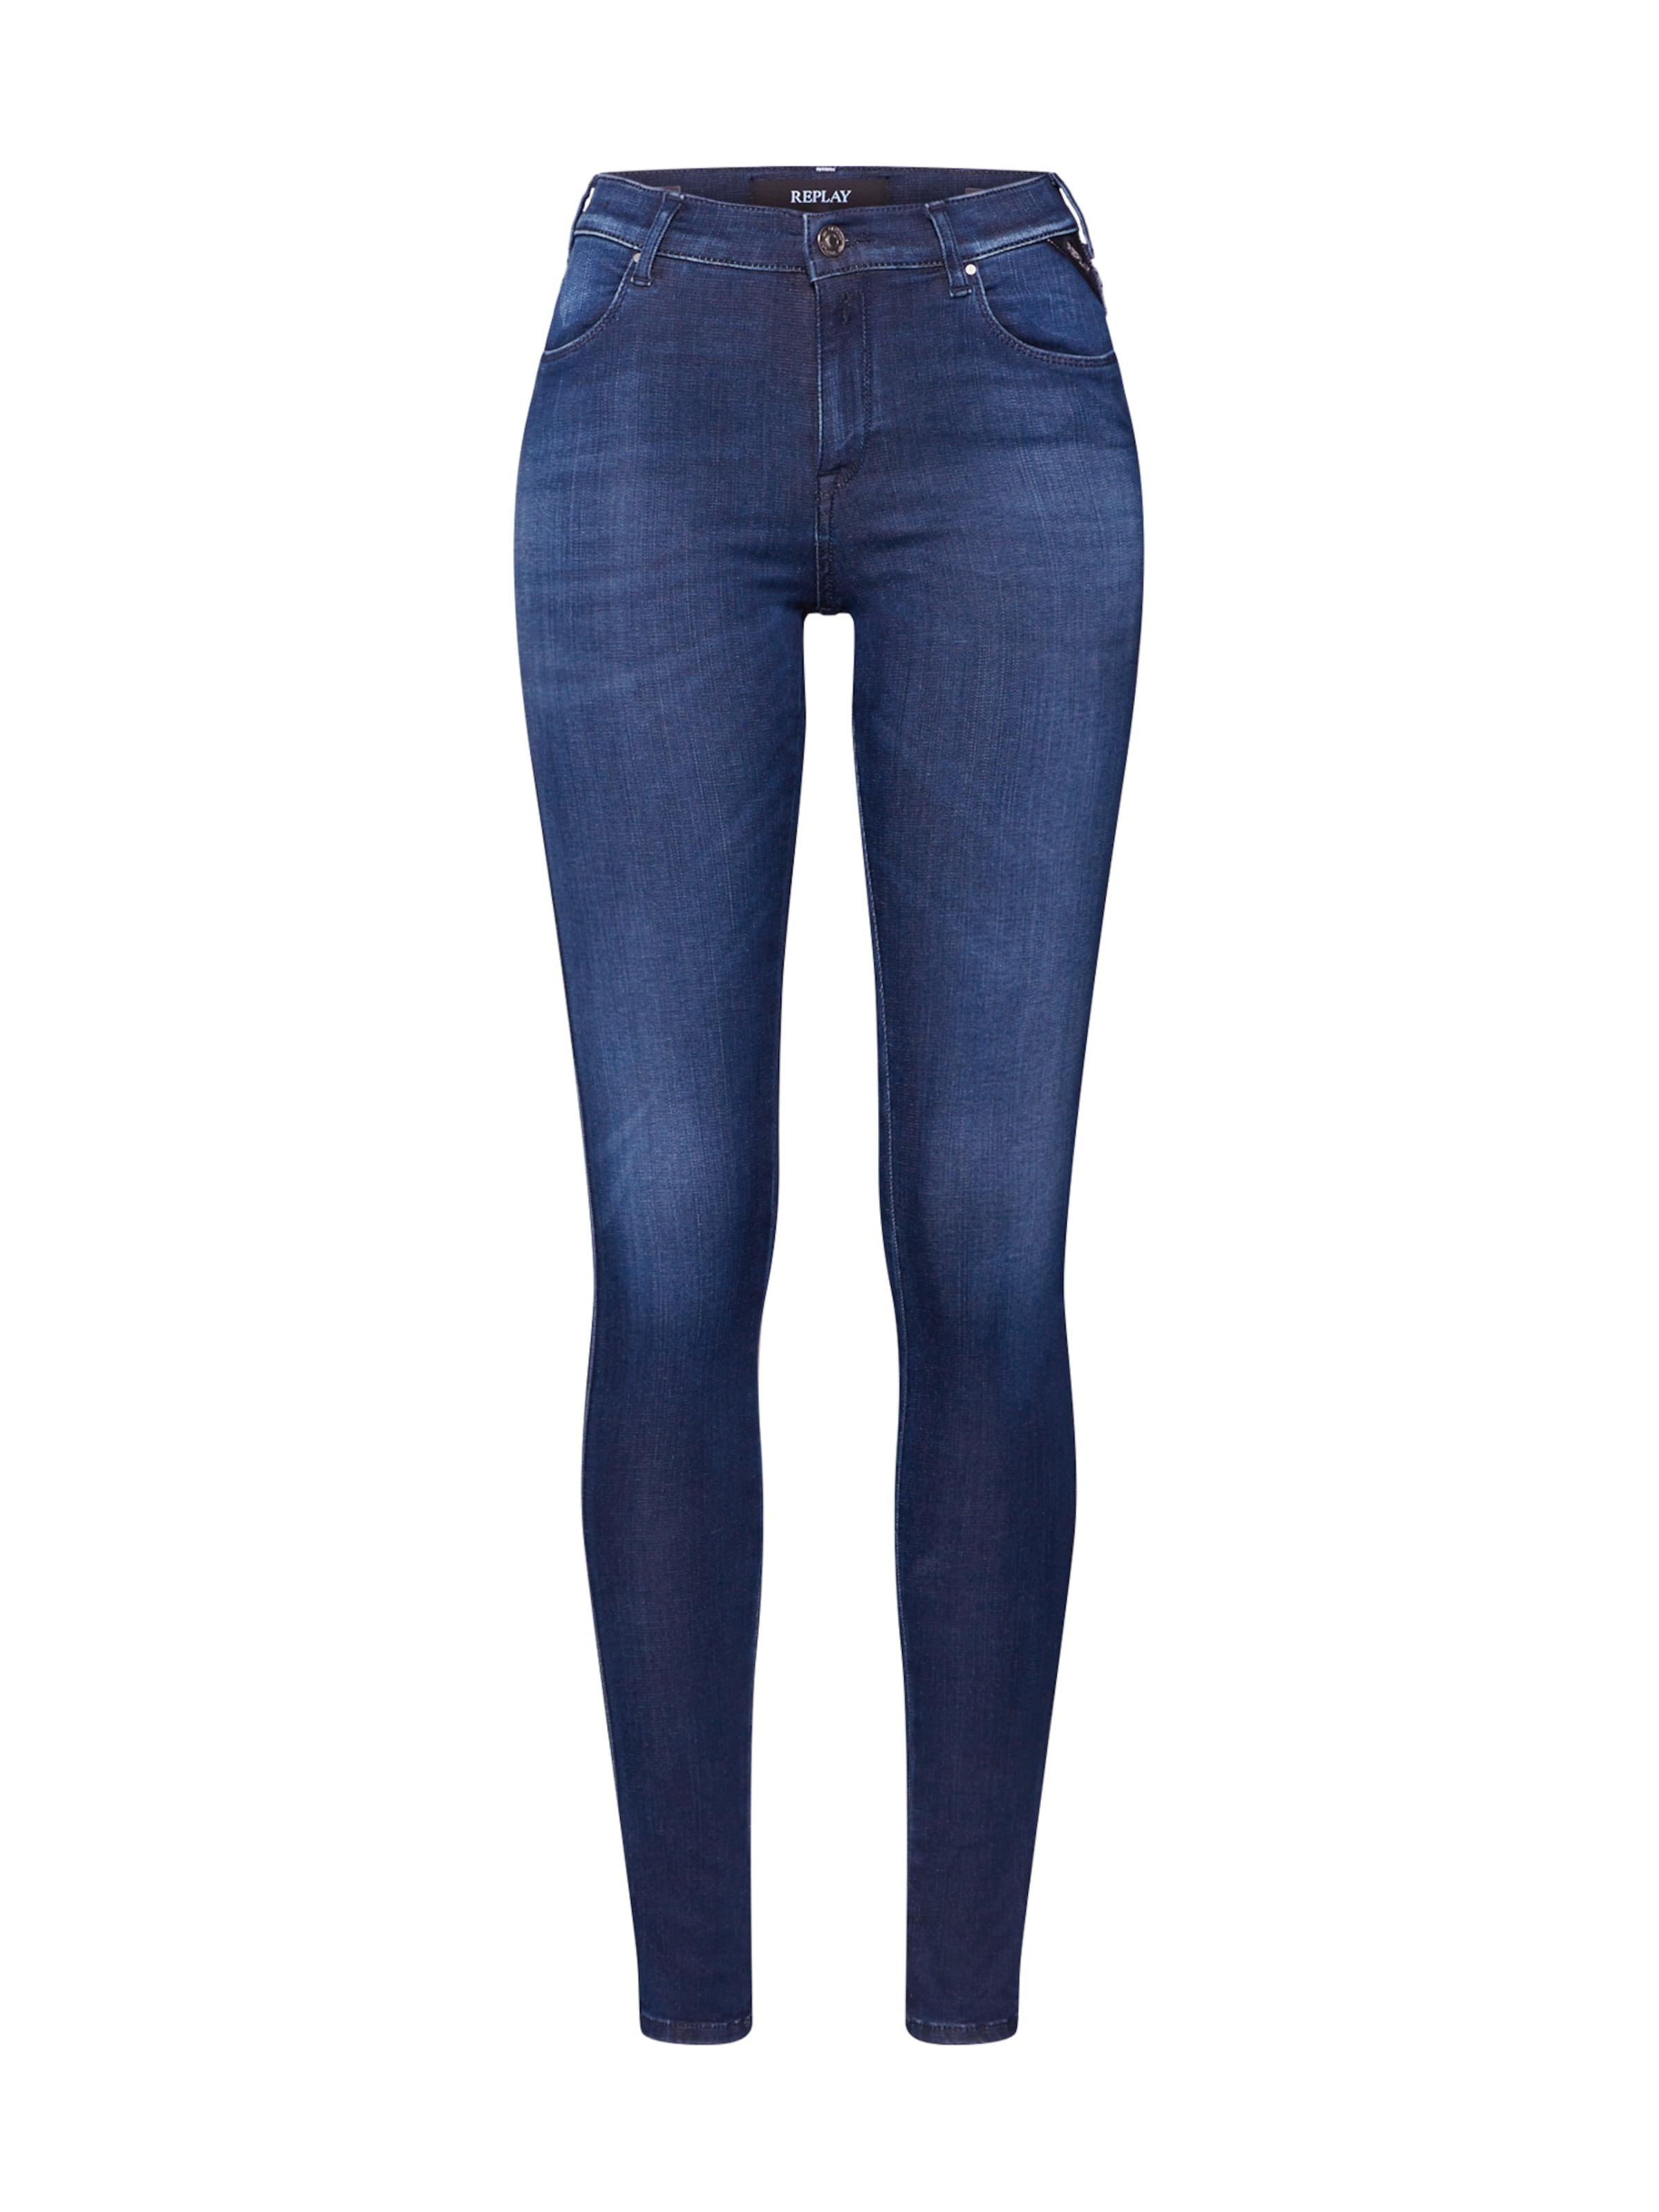 Dunkelblau Replay Jeans Jeans Jeans In 'stella' Replay Replay Dunkelblau In 'stella' JTFKu3l1c